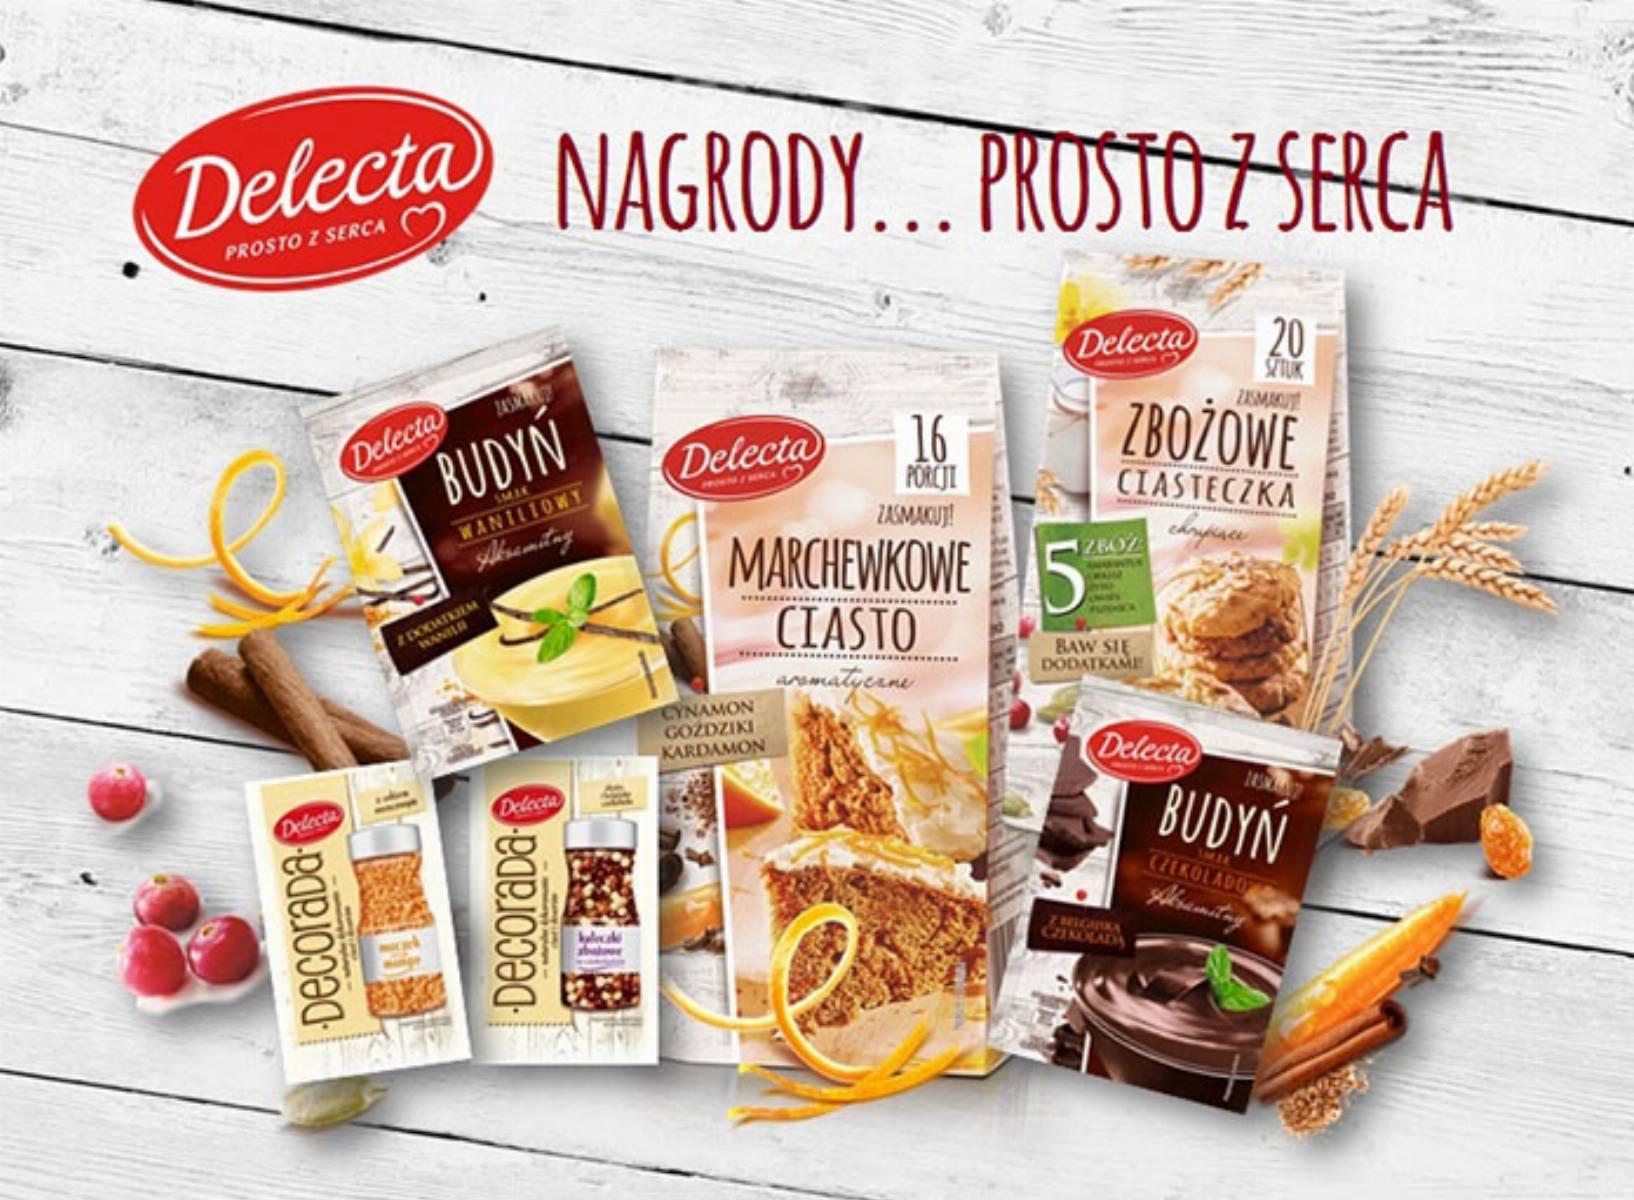 Delecta_konkurs marchewkowe_nagrody